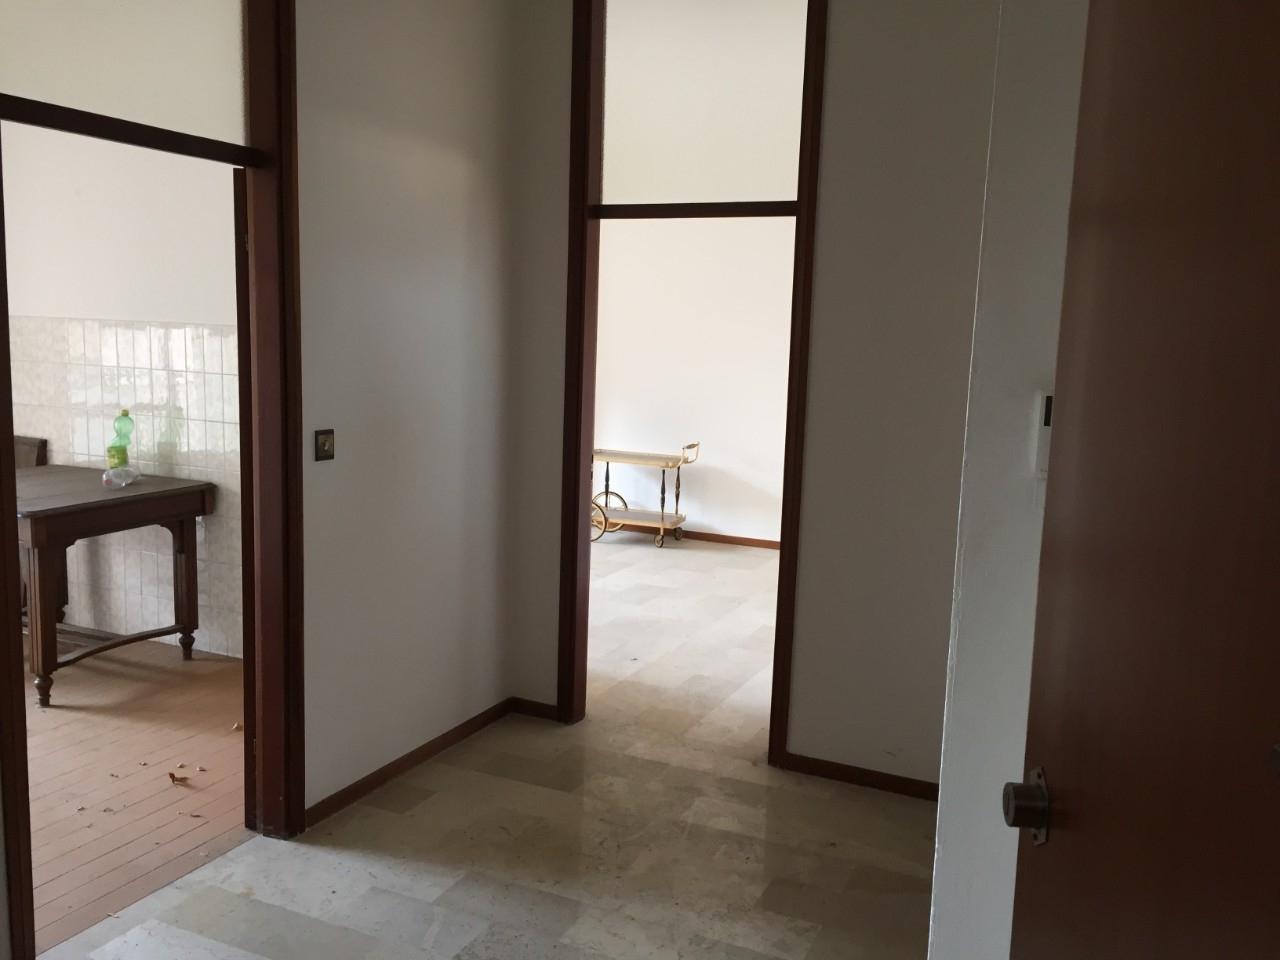 Appartamento in vendita Ravenna Zona San Biagio/San Vittore